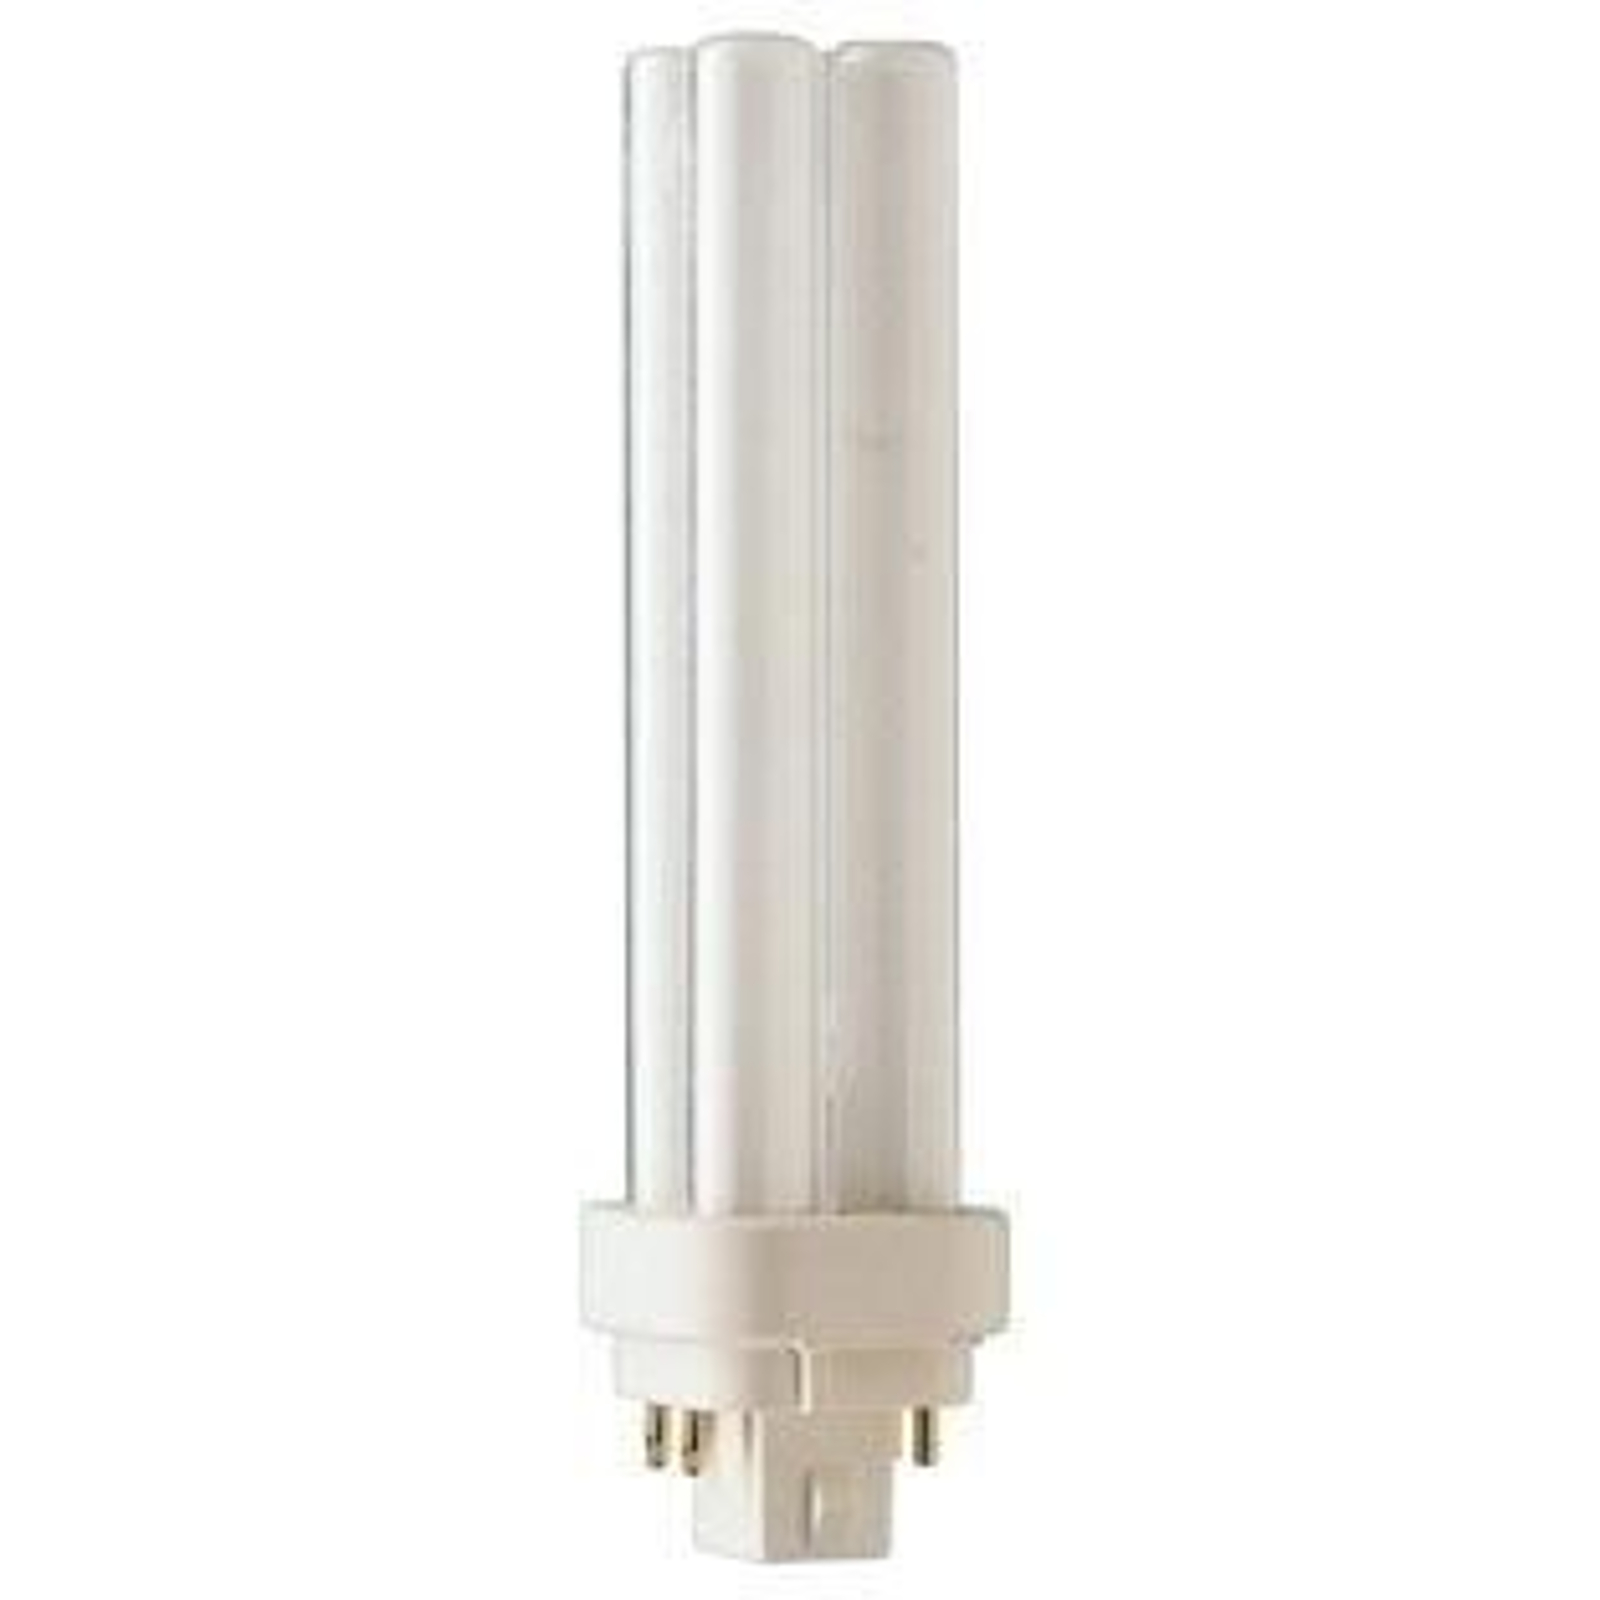 G24q 13W 830 Kompaktleuchtstofflampe DULUX D/E